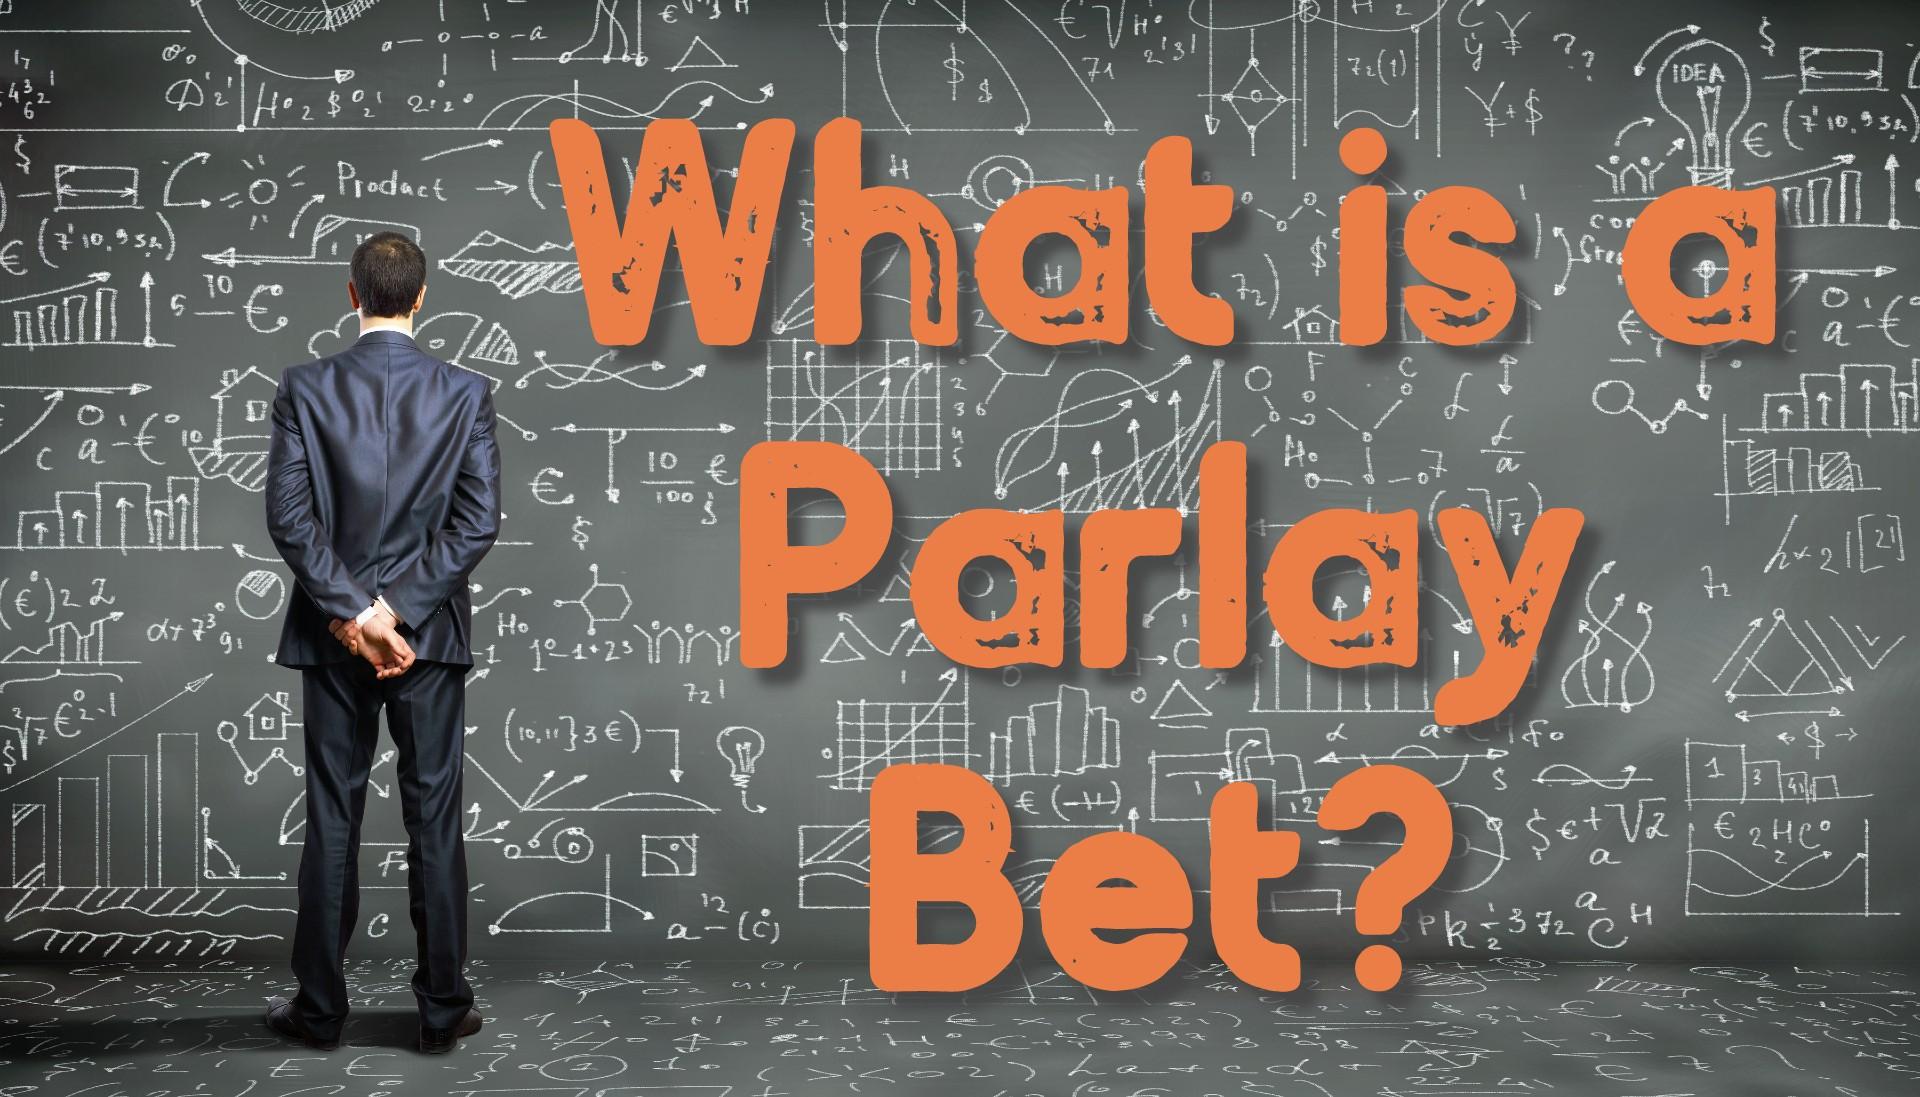 Parlay Betting